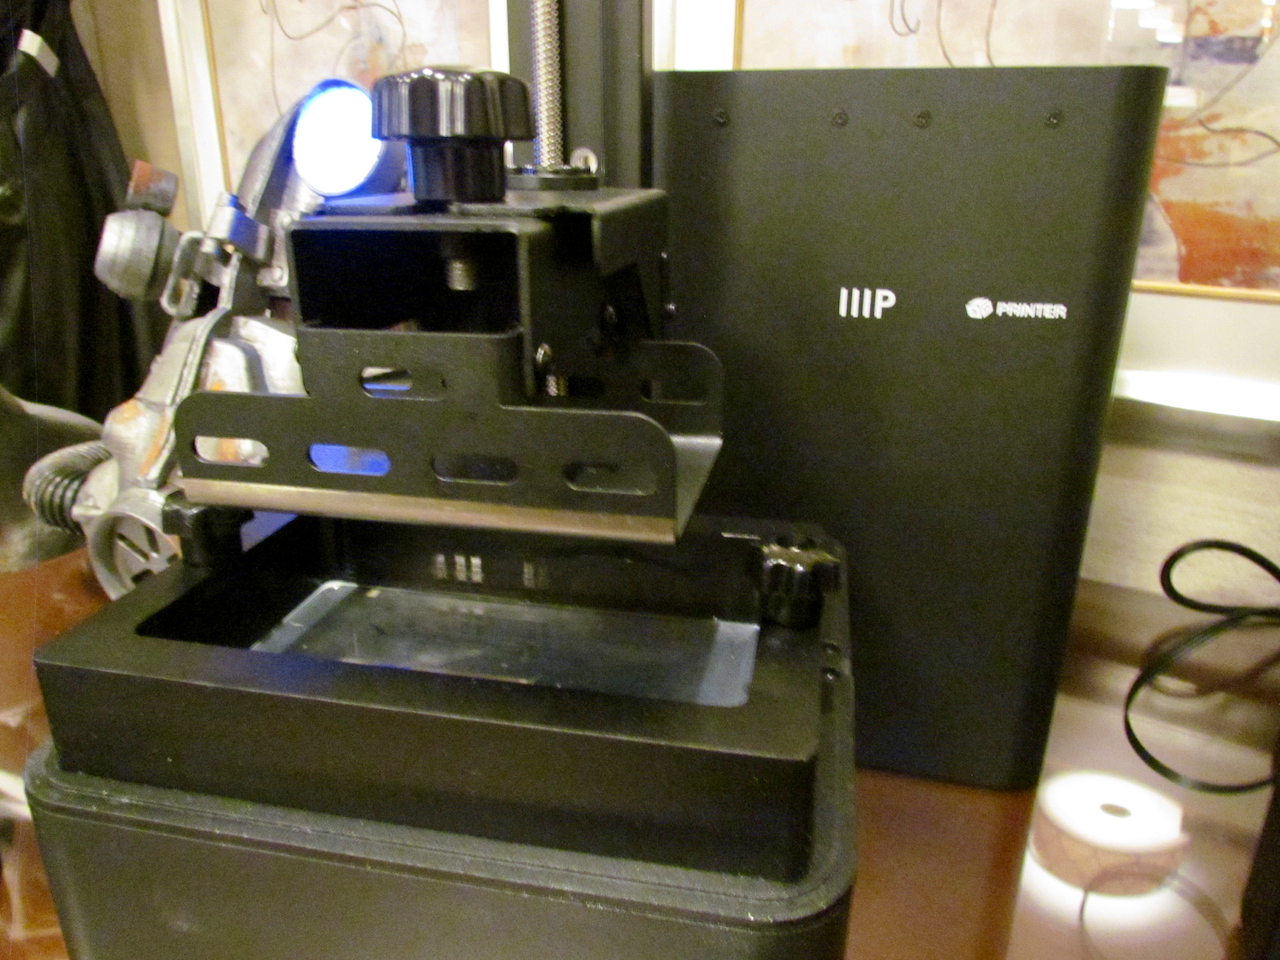 The new Monoprice inexpensive resin-based desktop 3D printer